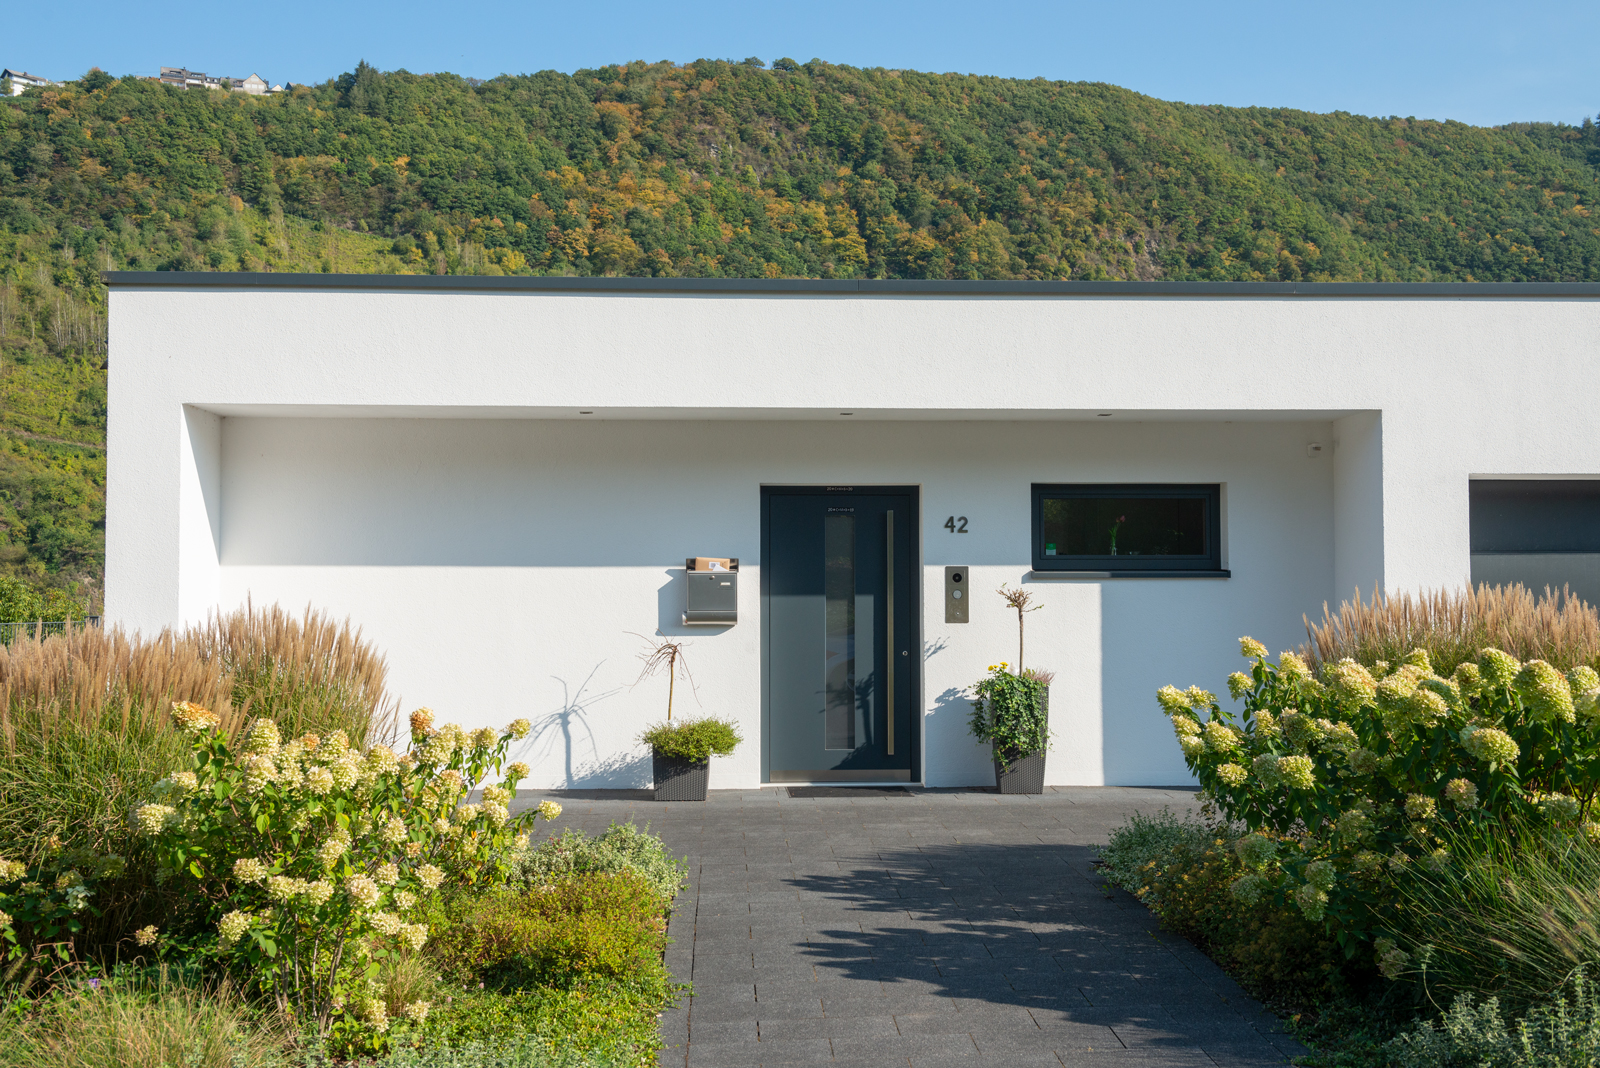 Eingang Wohnaus in Traben-Trarbach